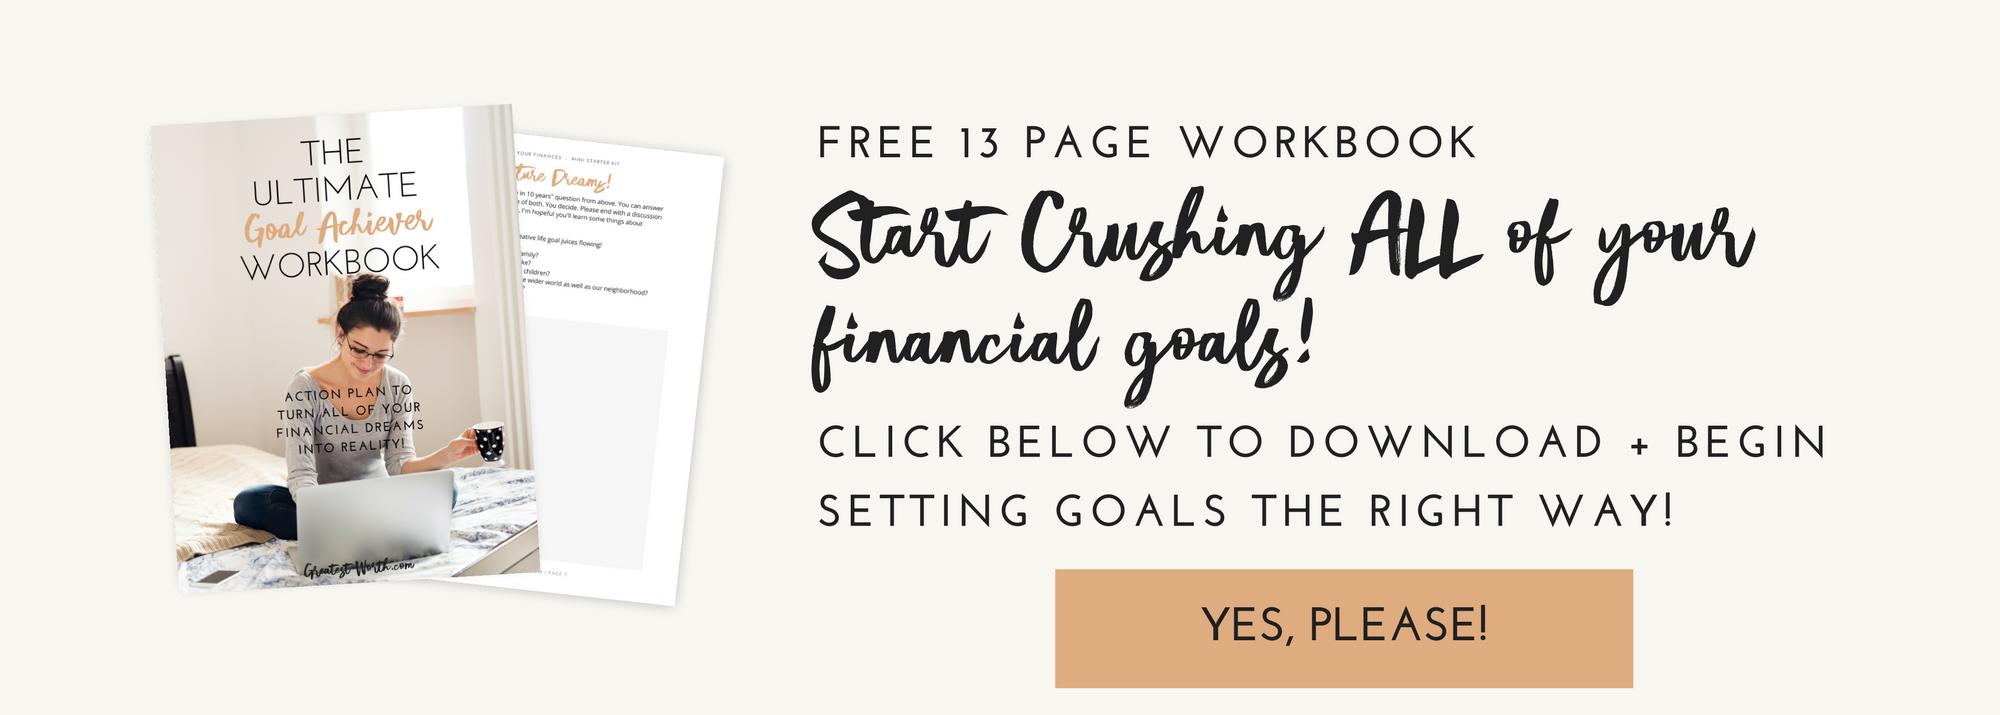 Workbooks goals workbook : 5 Steps to Sure Fire Financial Goal Setting | FREE Workbook ...